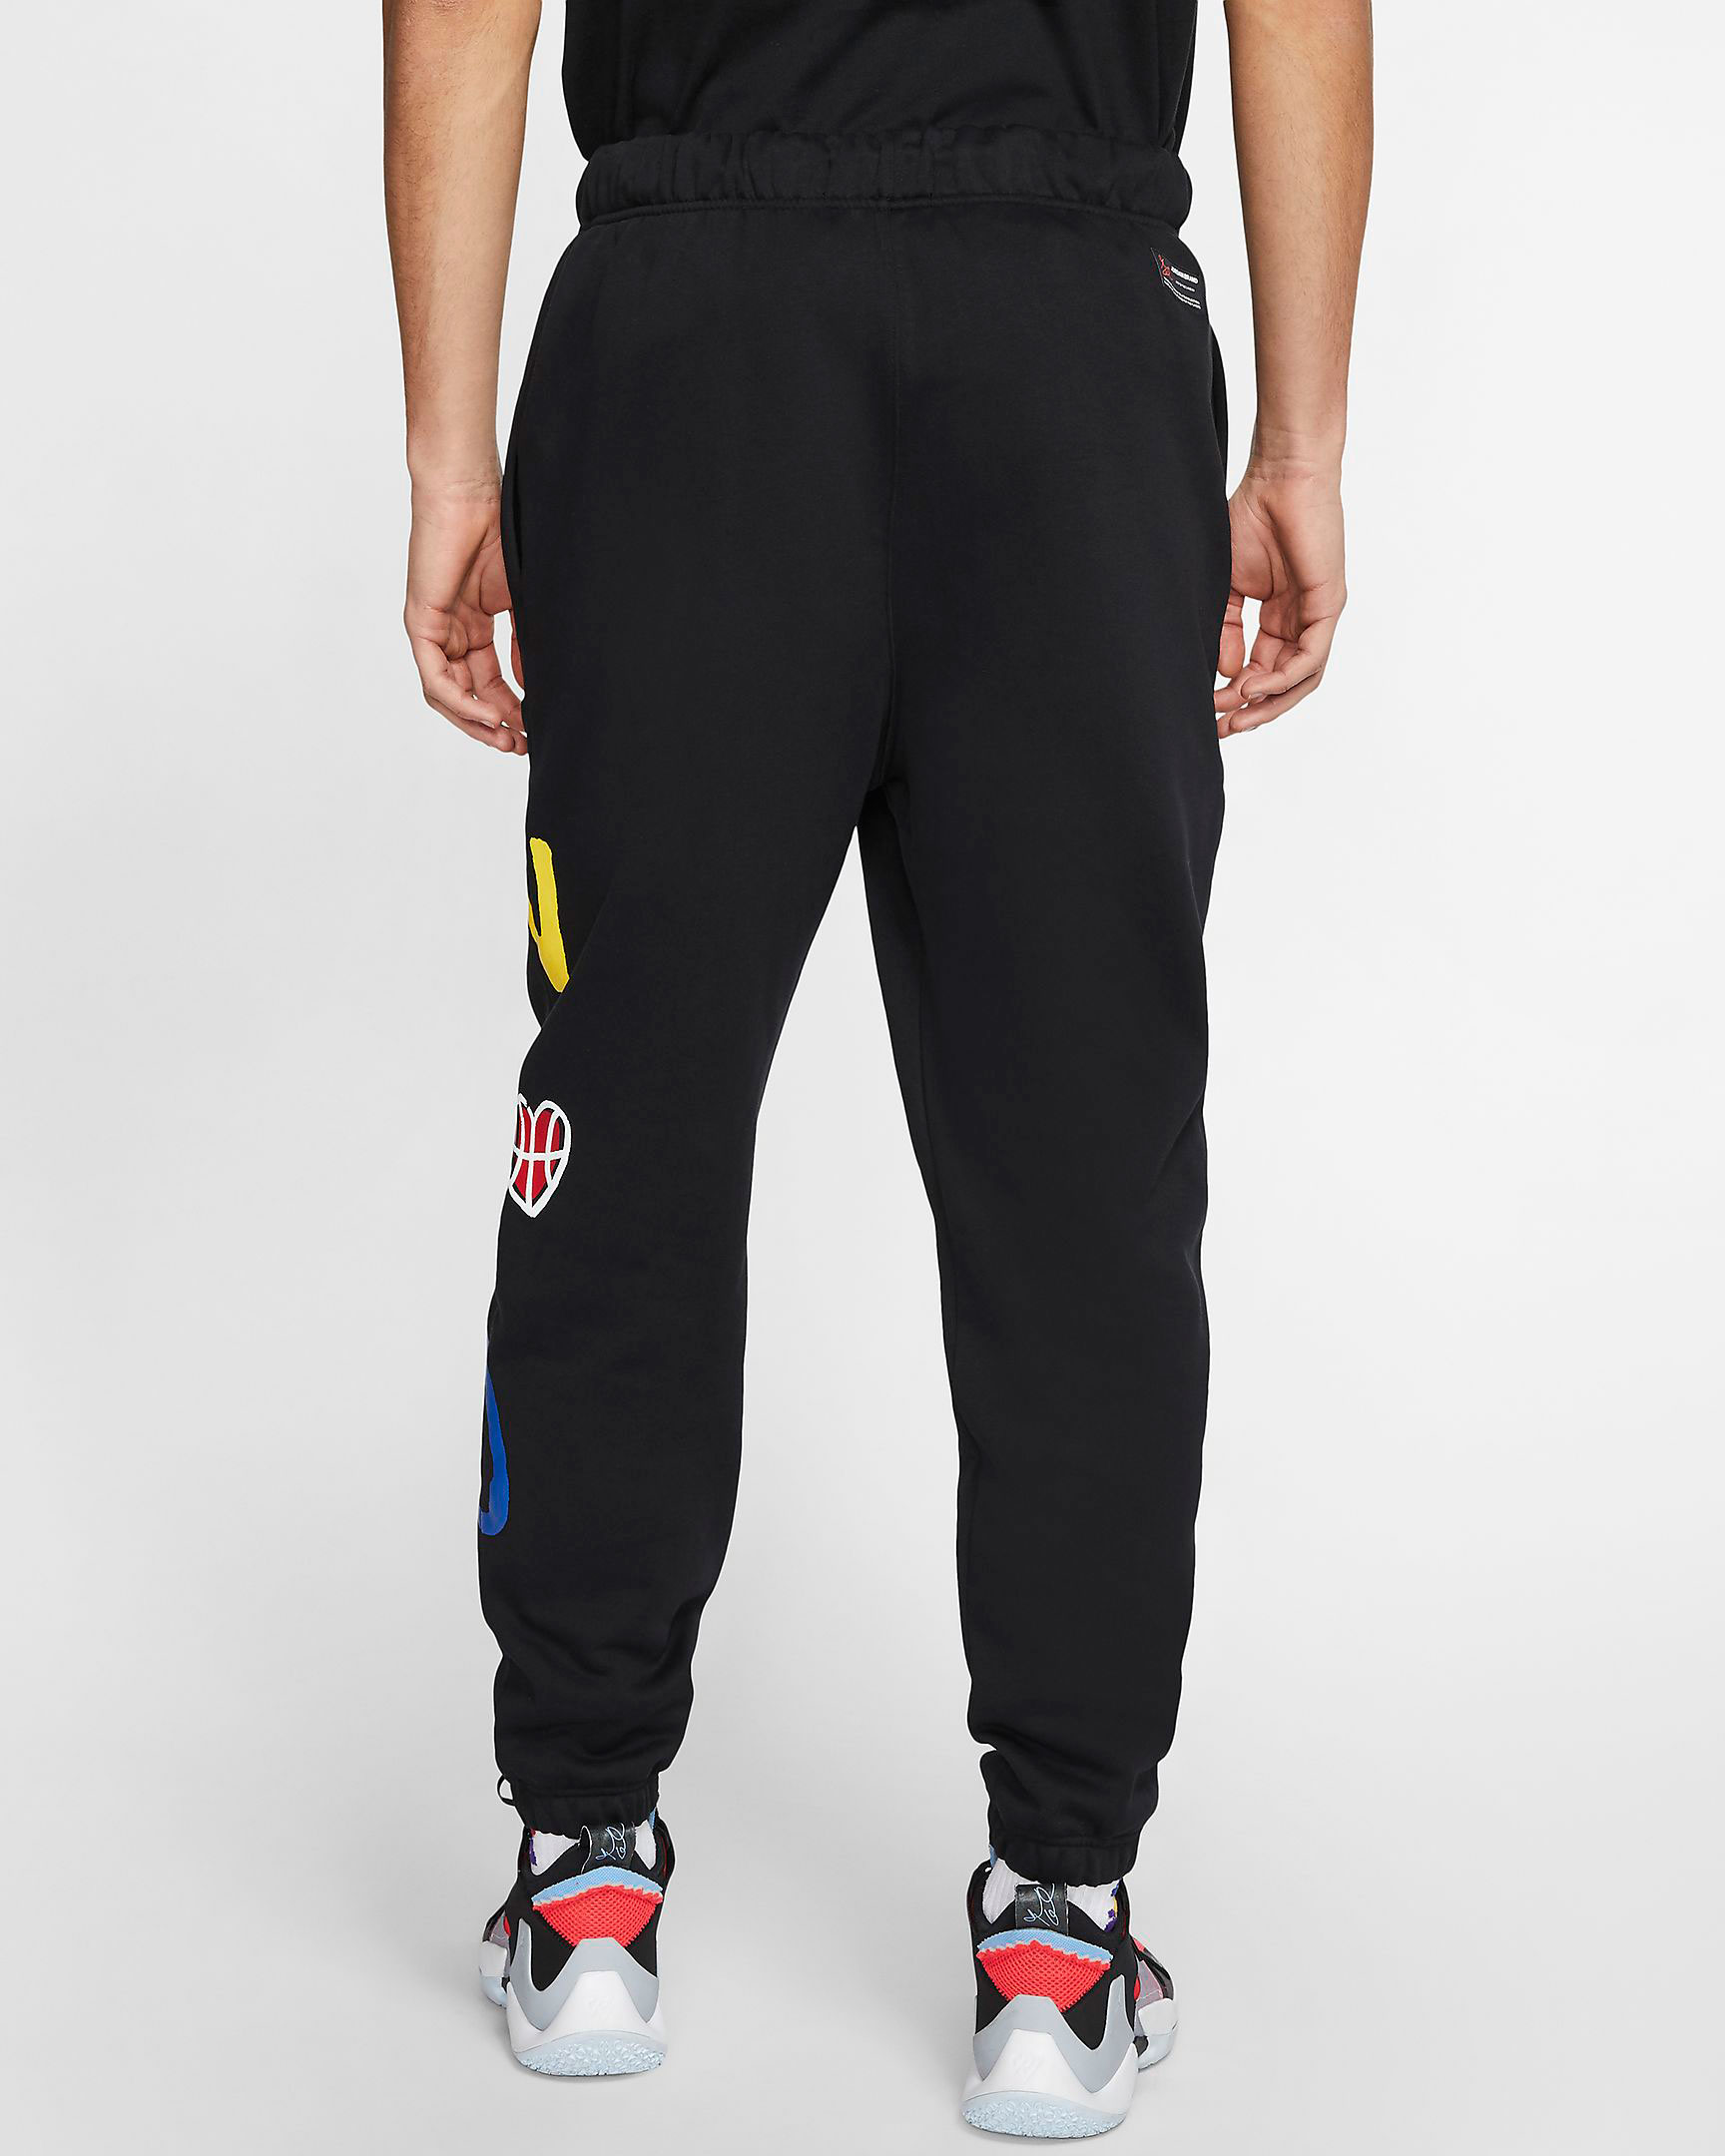 jordan-westbrook-why-not-zer03-pants-black-2